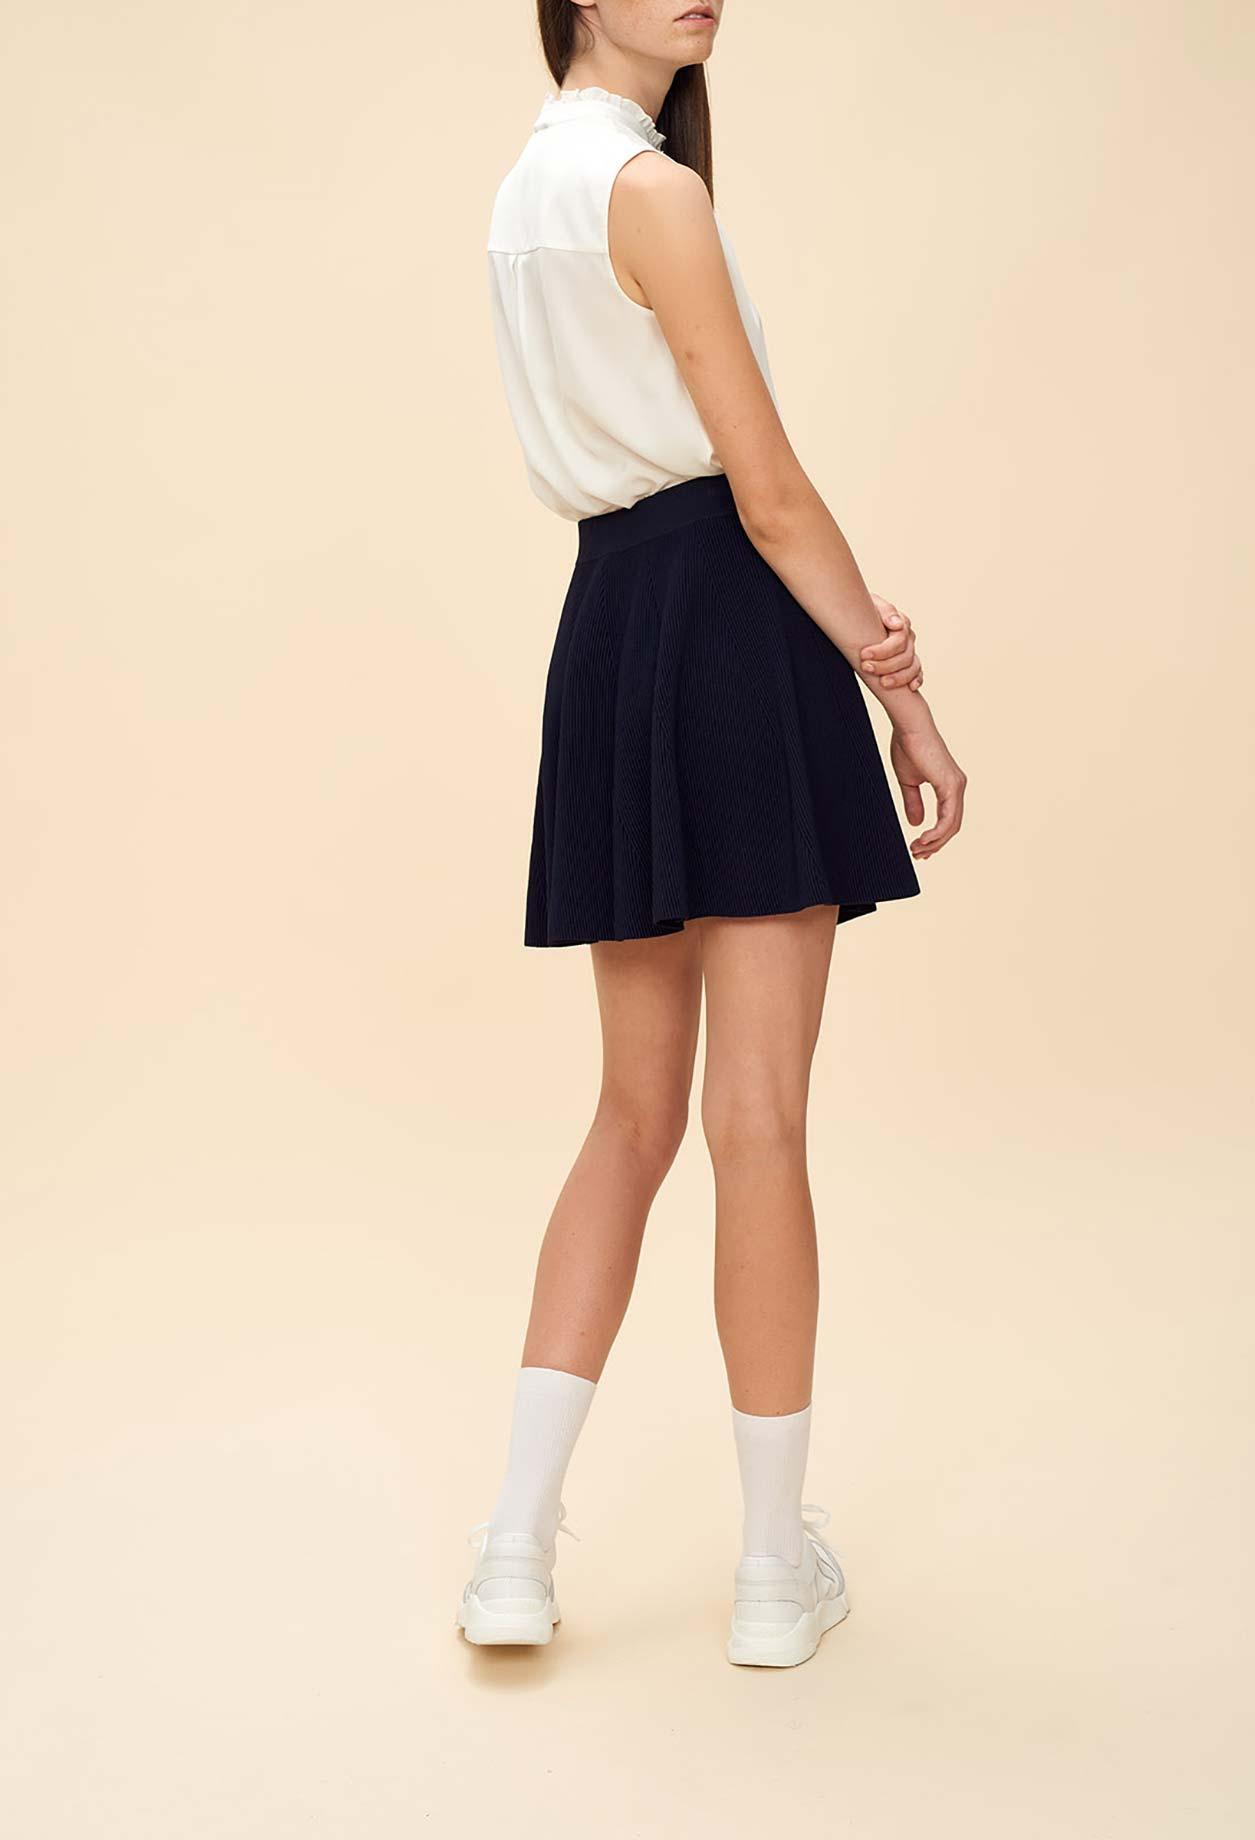 Et Pierlot Malia Claudie Shorts Jupes 05ZqxqSH